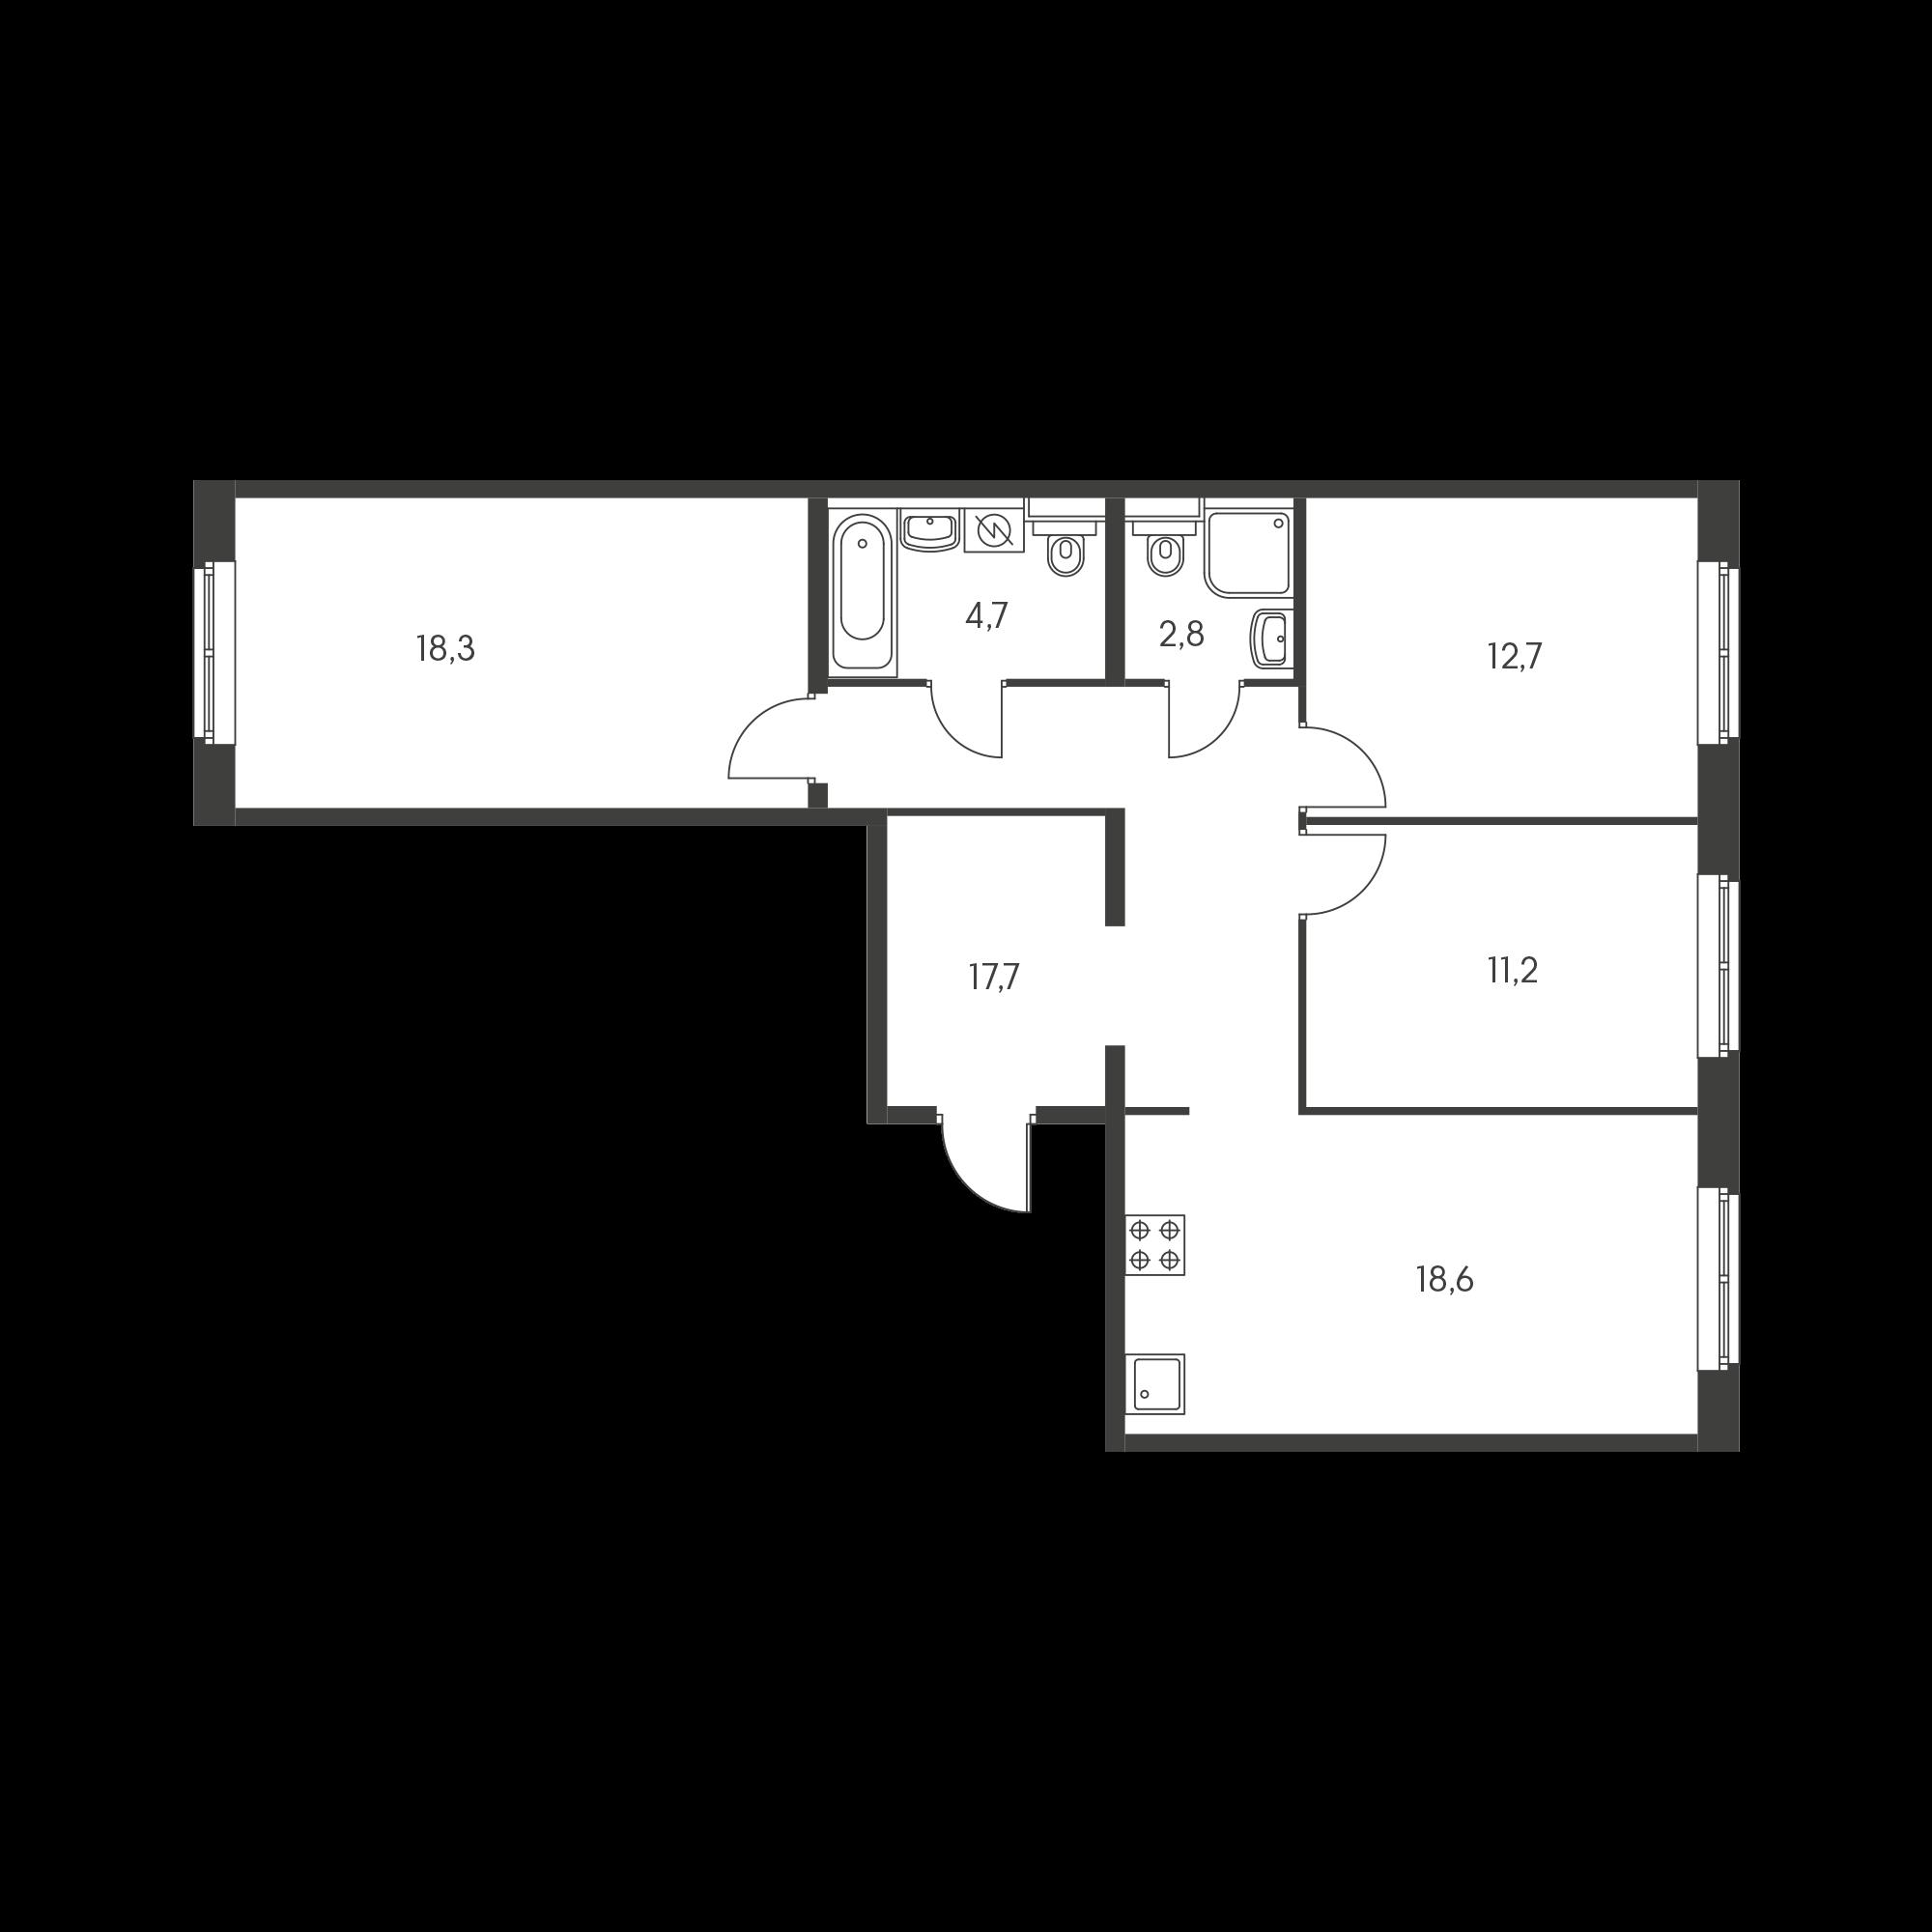 3EL3_9.6-1_1